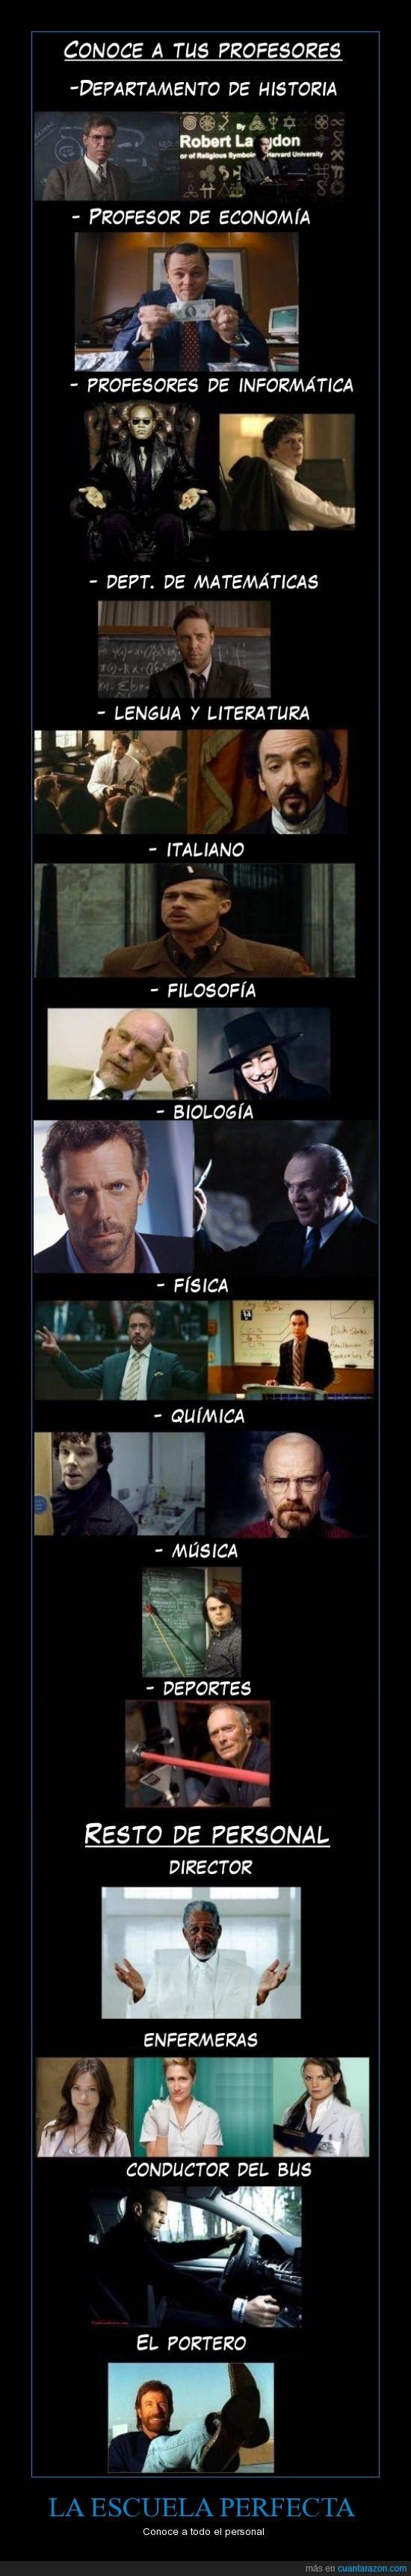 Chuck Norris,doctor house,jason statham,leonardo dicaprio,morgan freeman,sheldon,tony stark,v,walter white